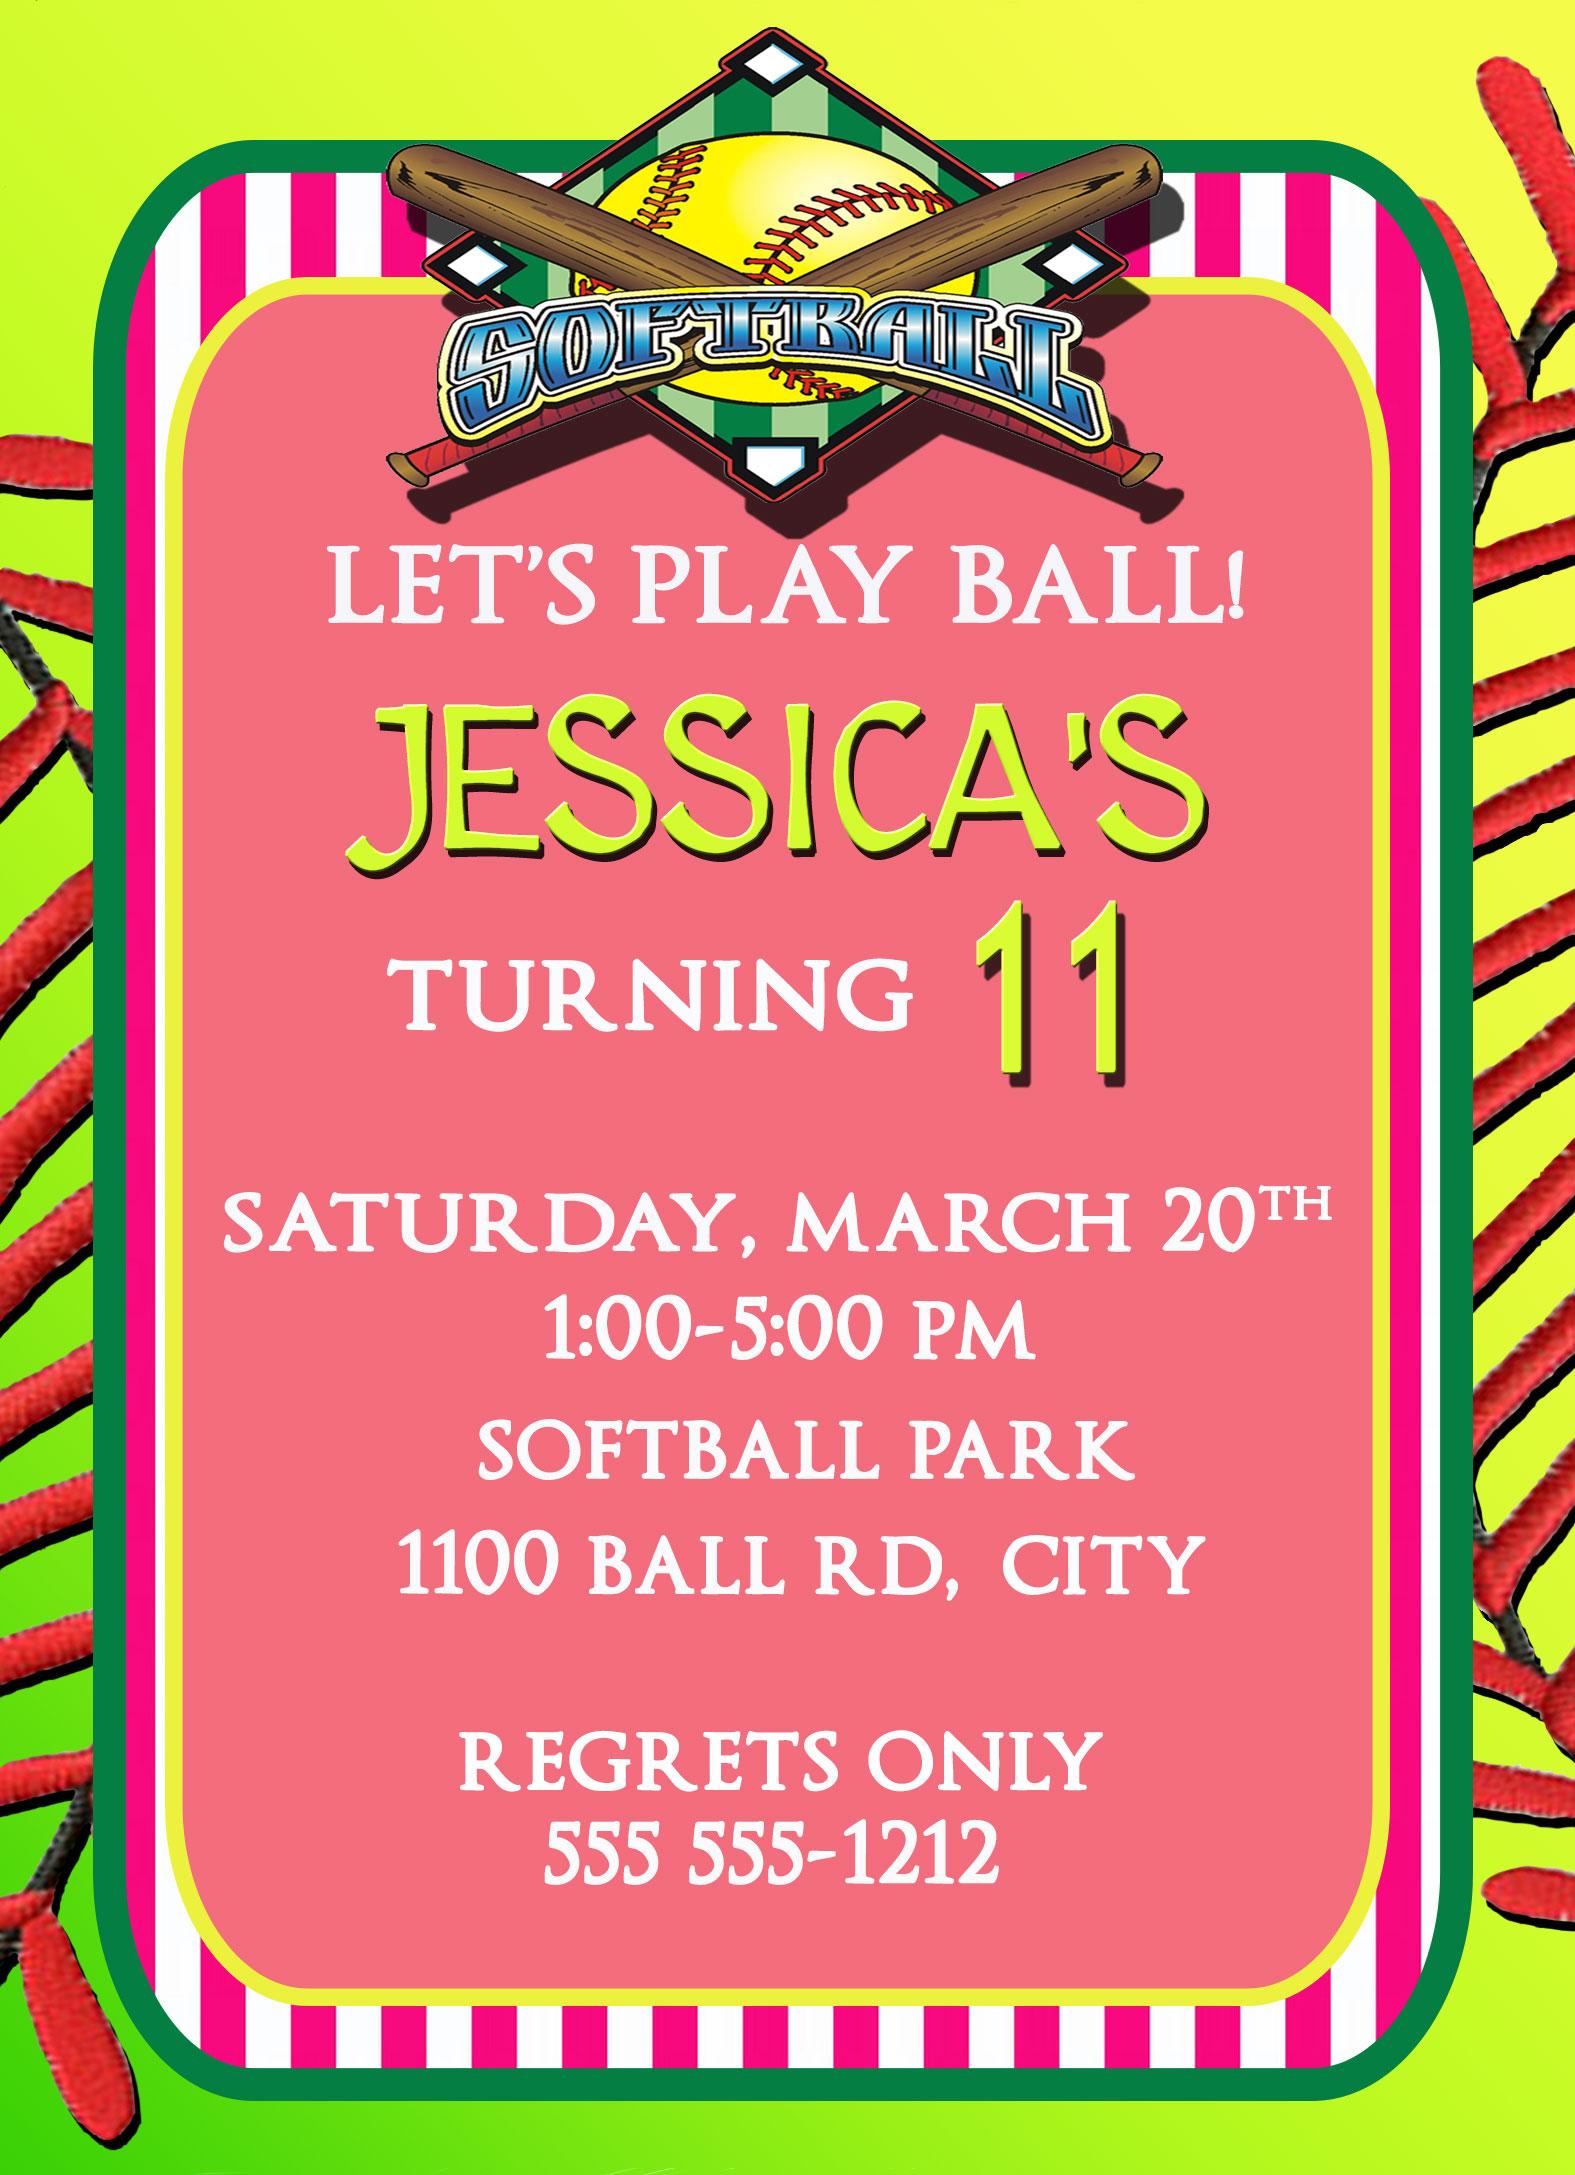 Softball Personalized Birthday Invitation 2 Sided ...